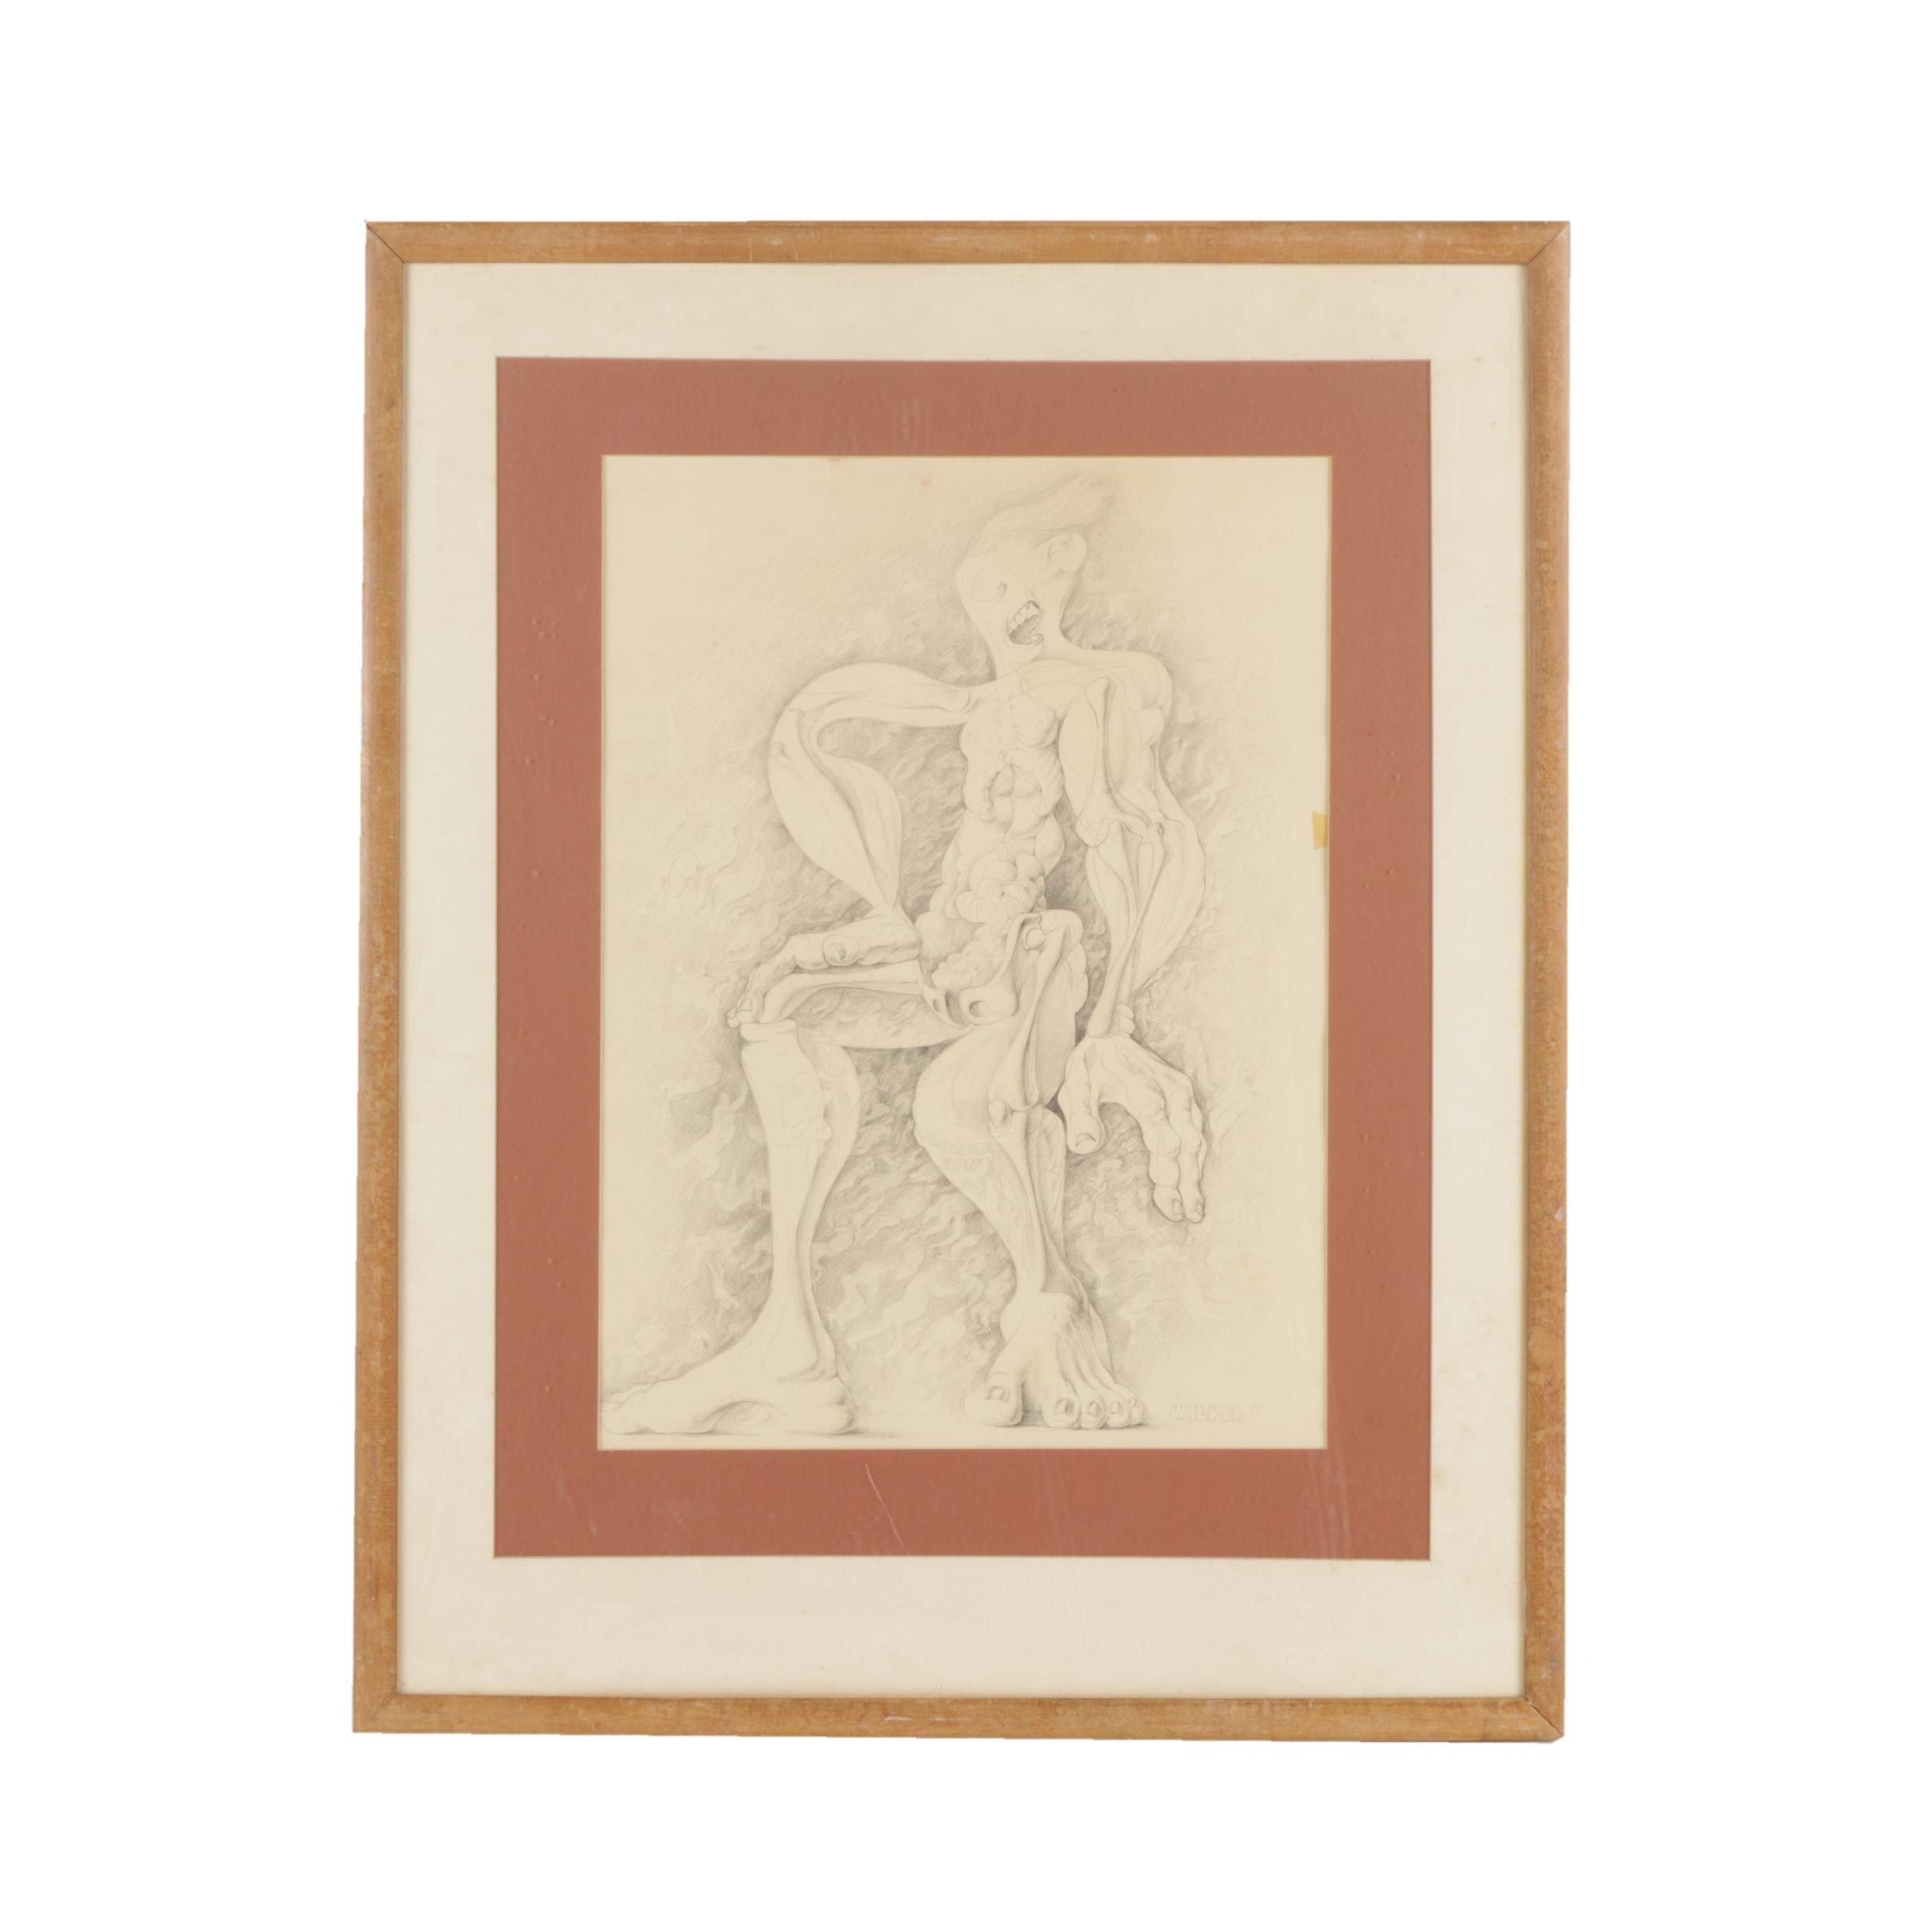 David Walker Graphite Drawing on Paper